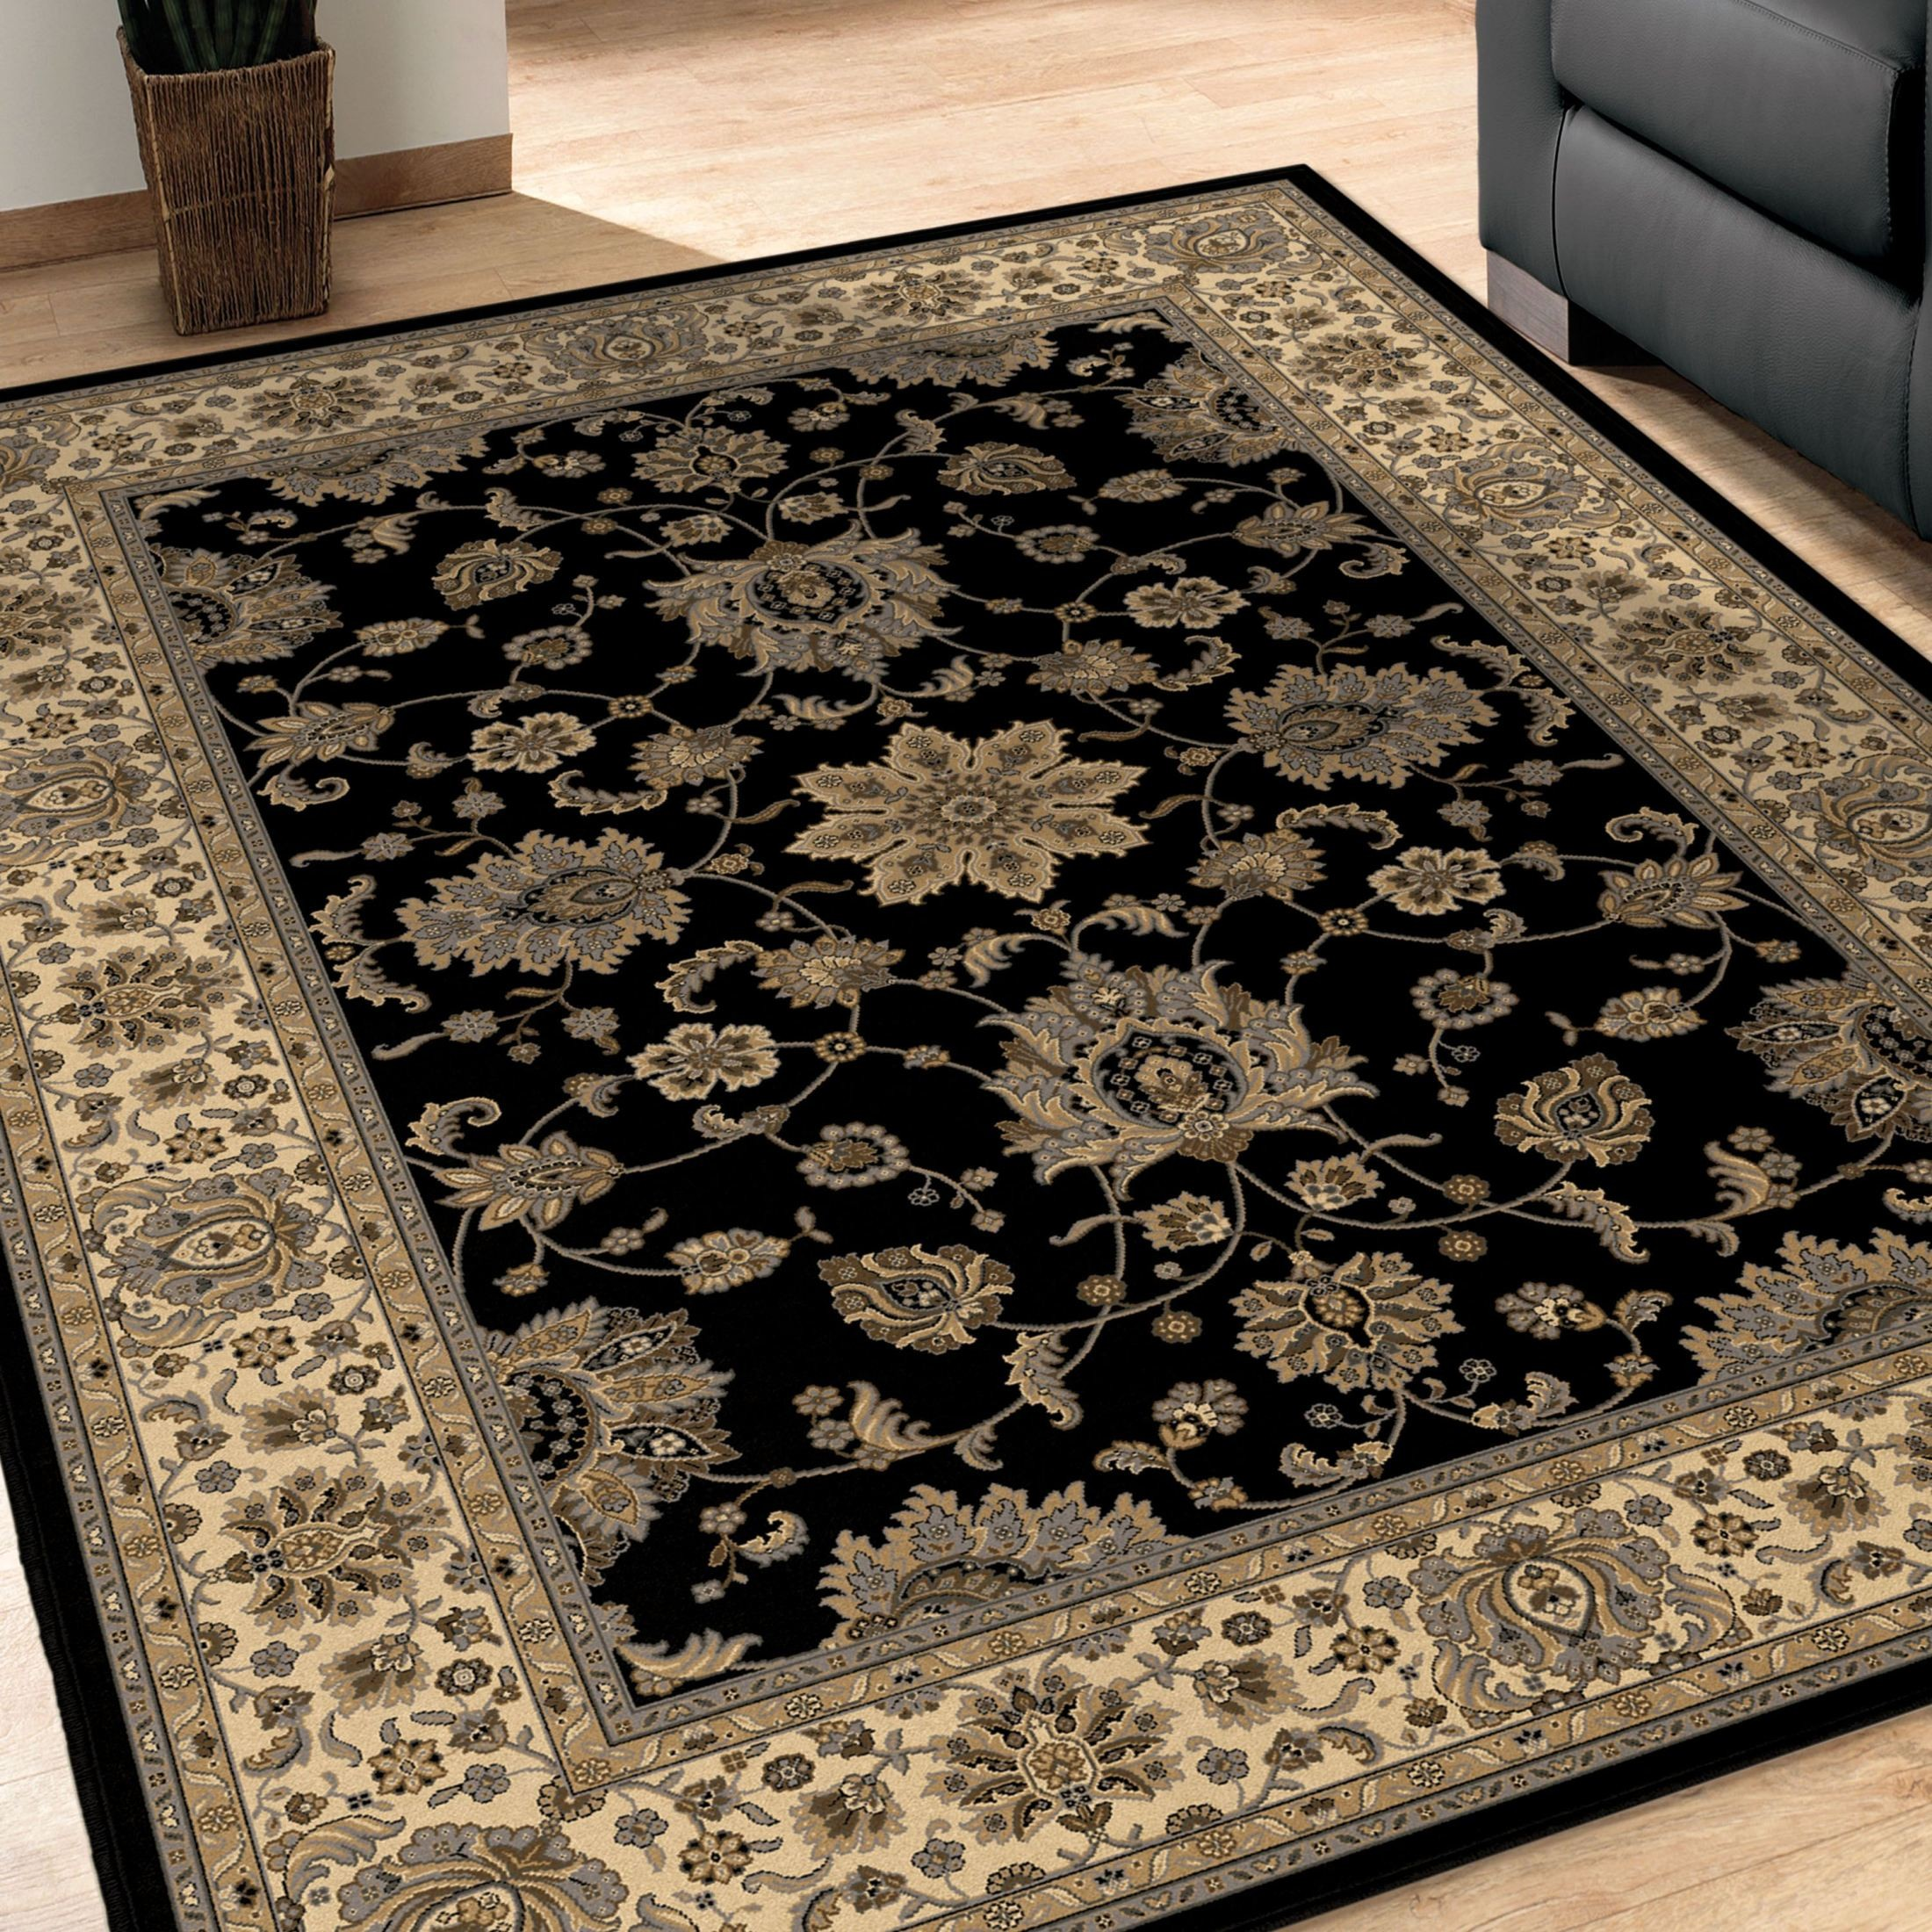 orian rugs detailed design traditional borokan black area. Black Bedroom Furniture Sets. Home Design Ideas